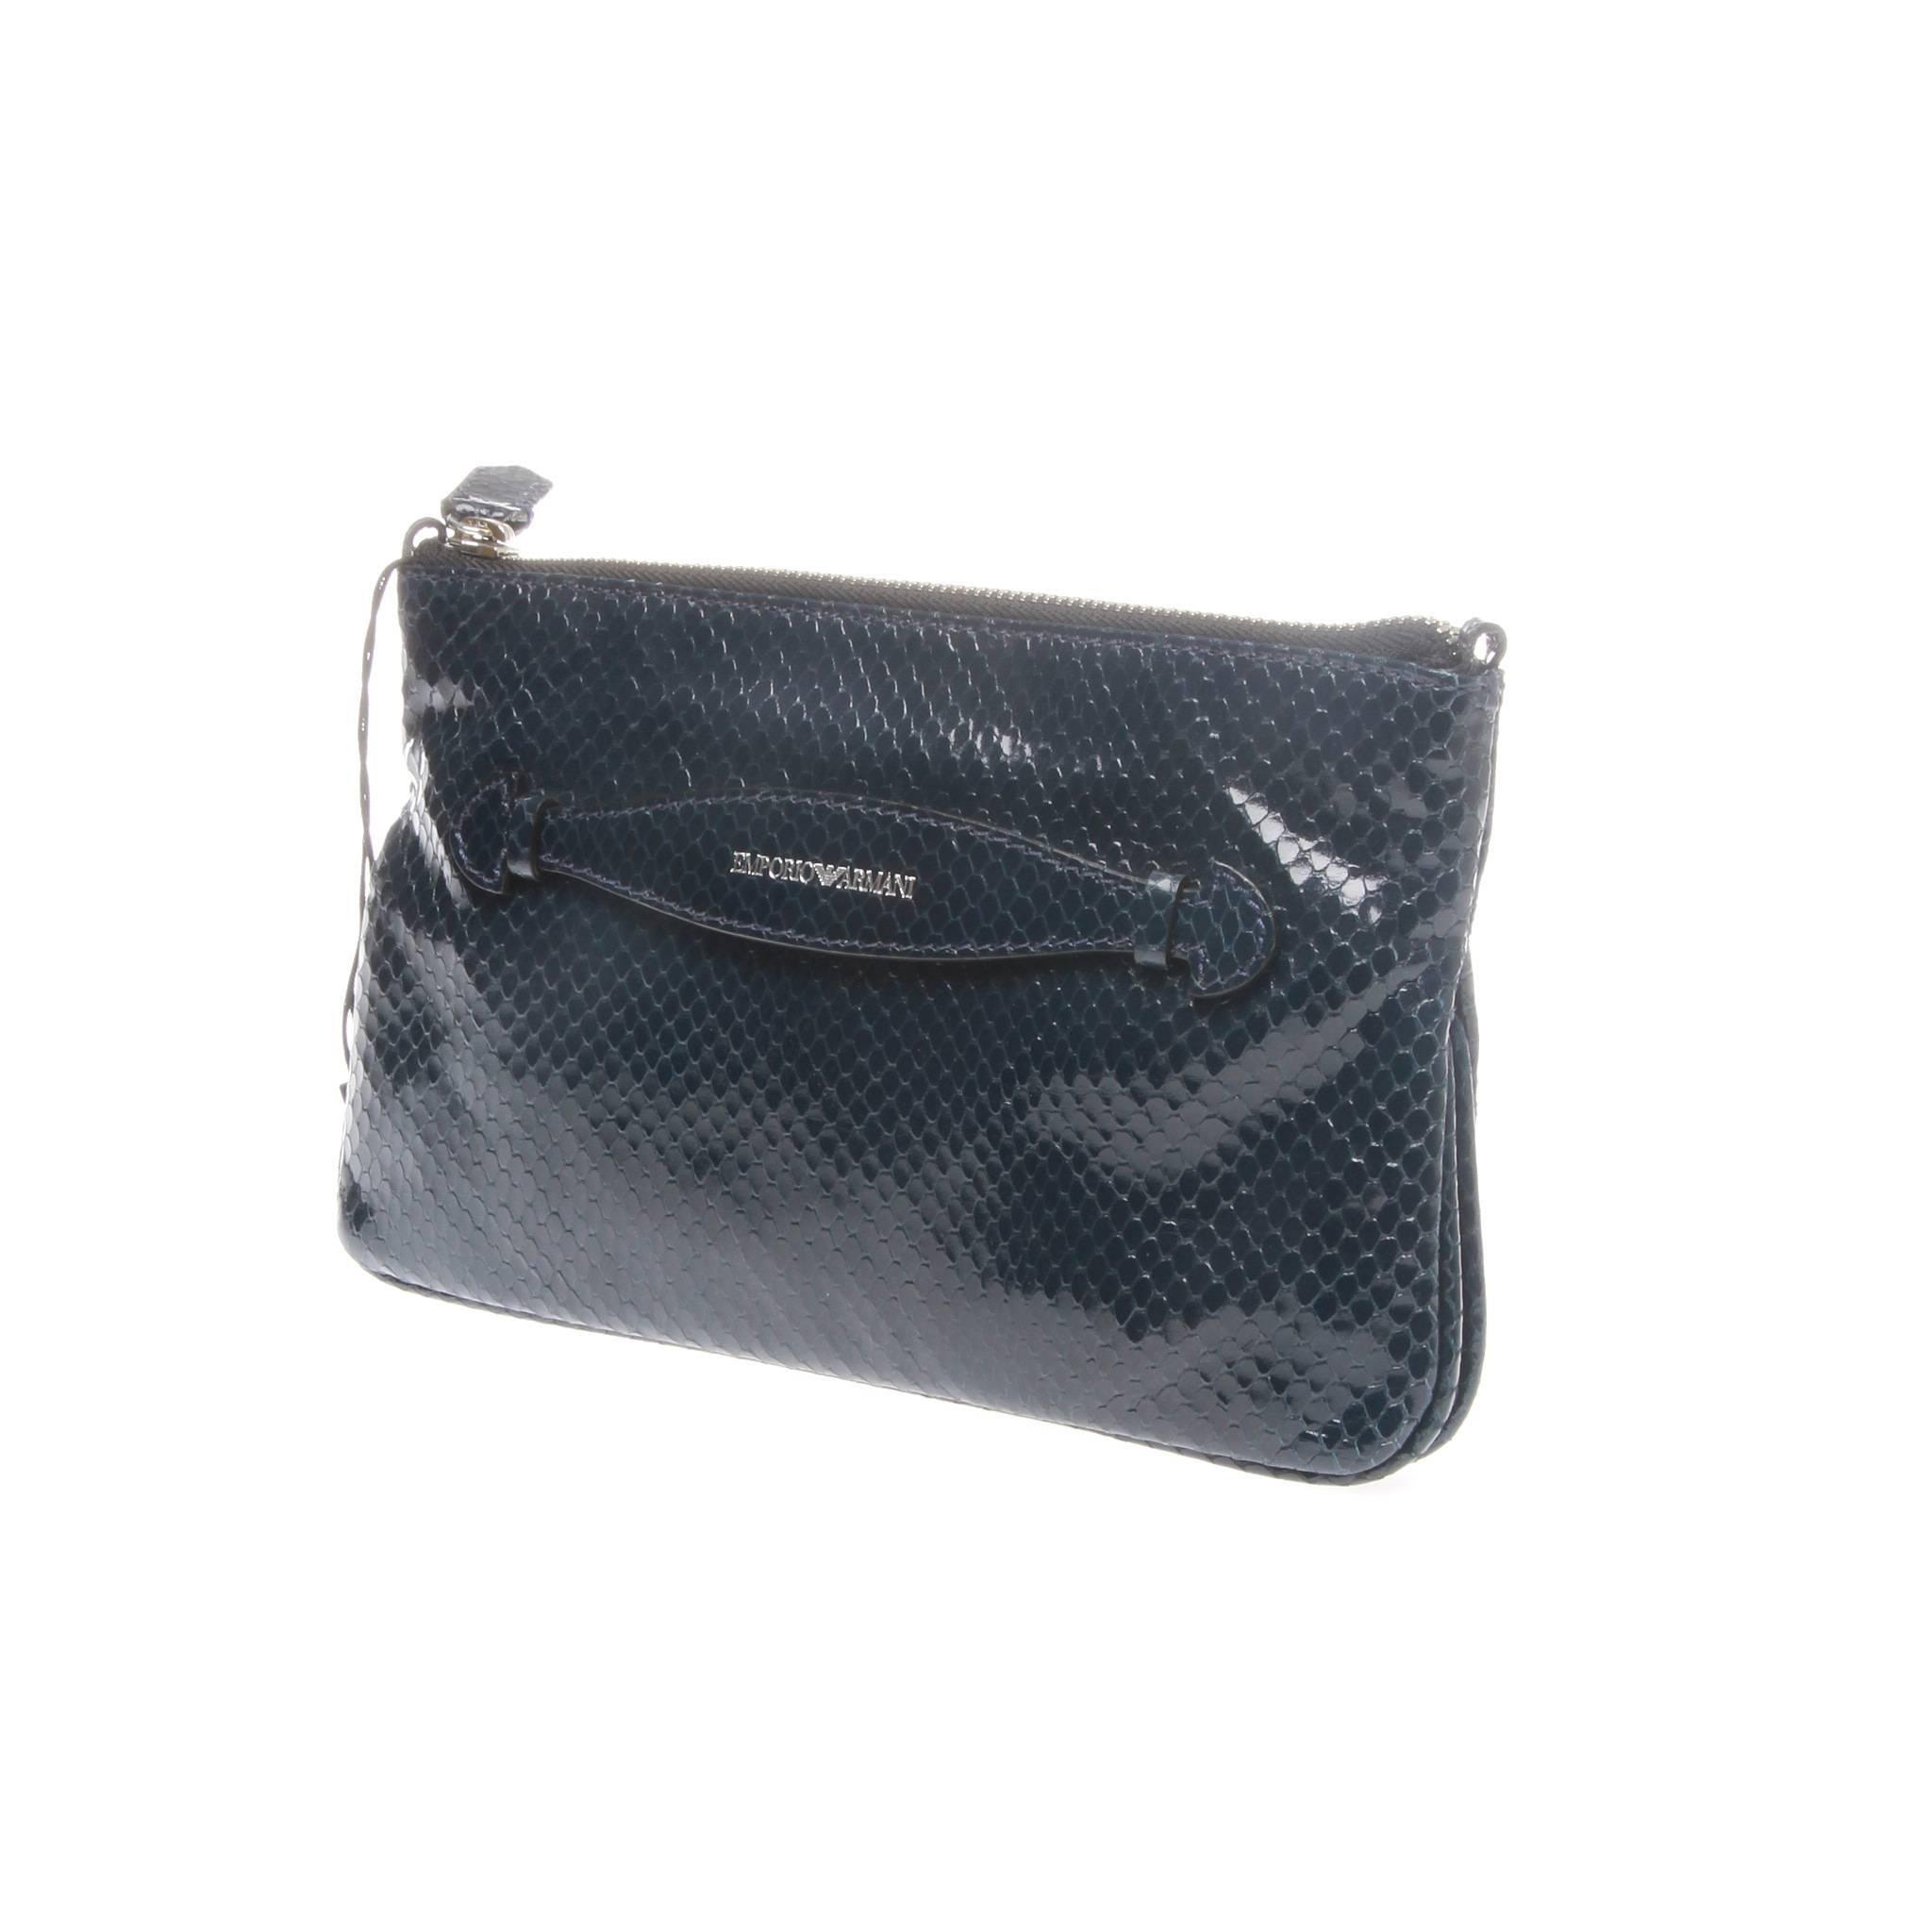 1stdibs Emporio Armani Clutch Shoulder Bag dazp7rG